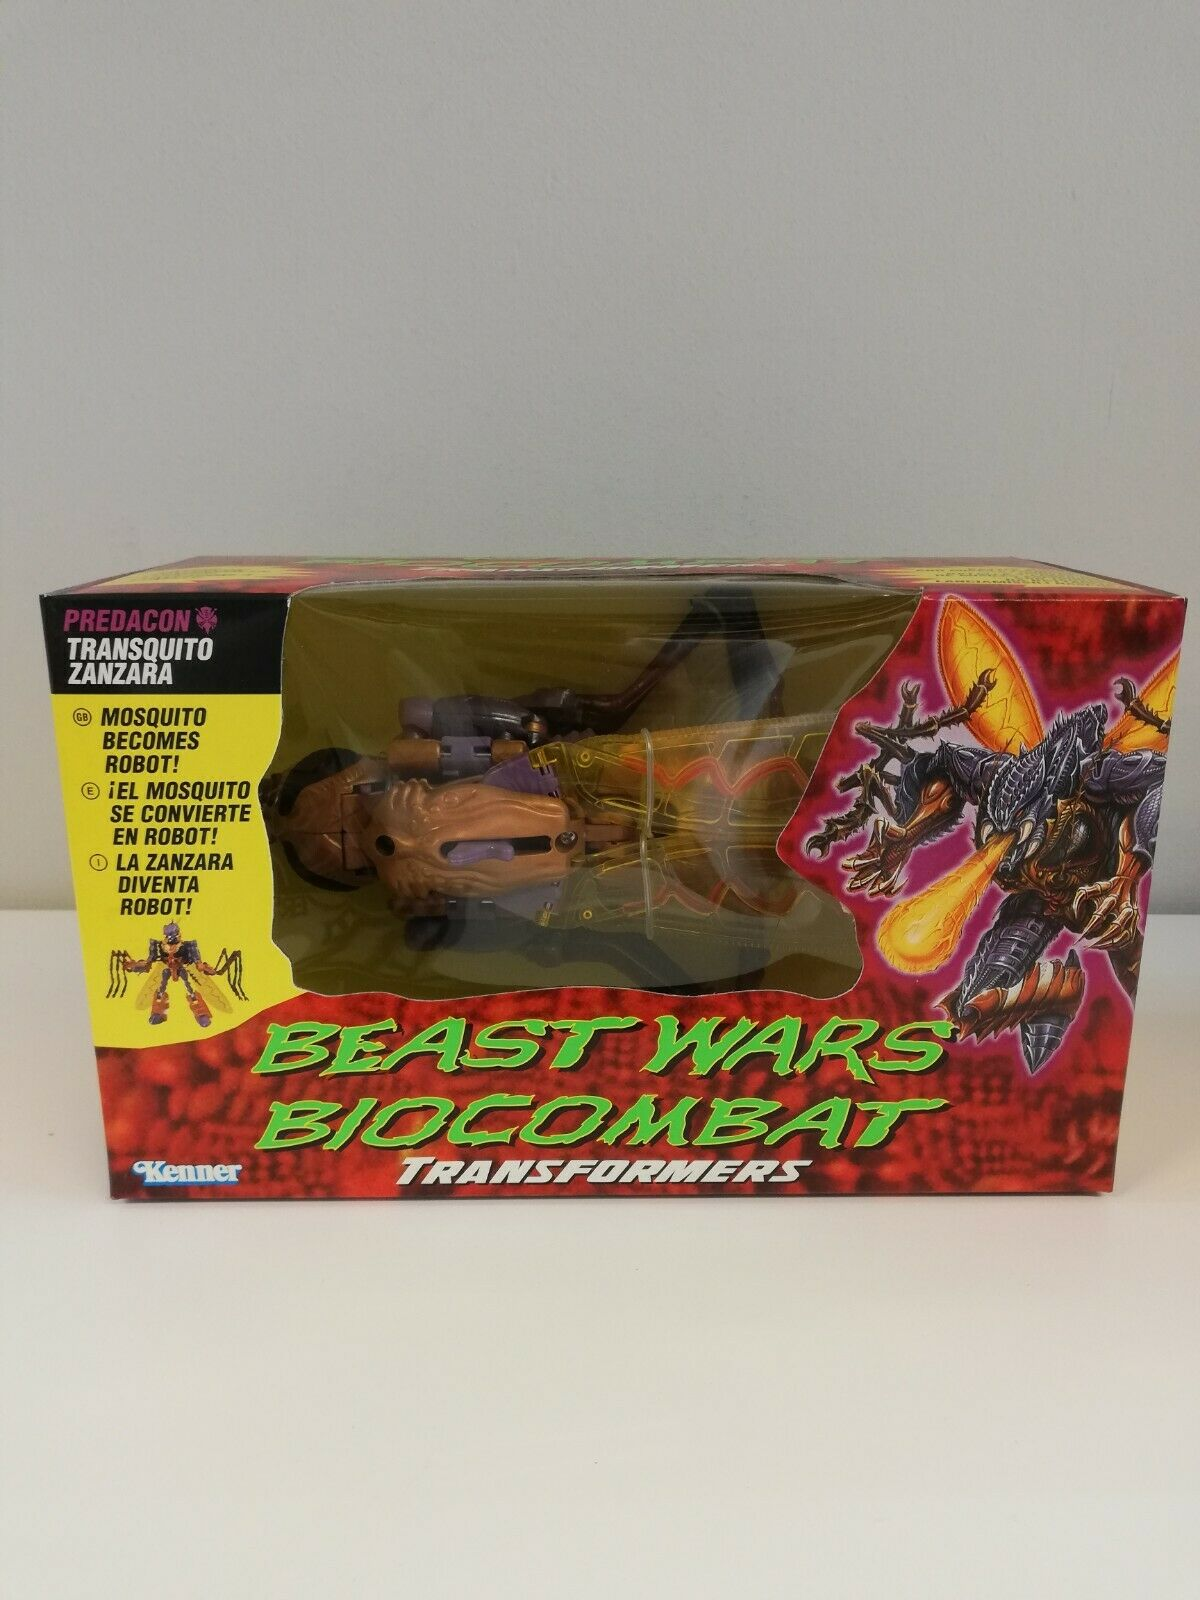 Antigüedades, Transformers, Besteias y Besteias contra bio - campbart, radar transquito, zanzara, Kenner 97.